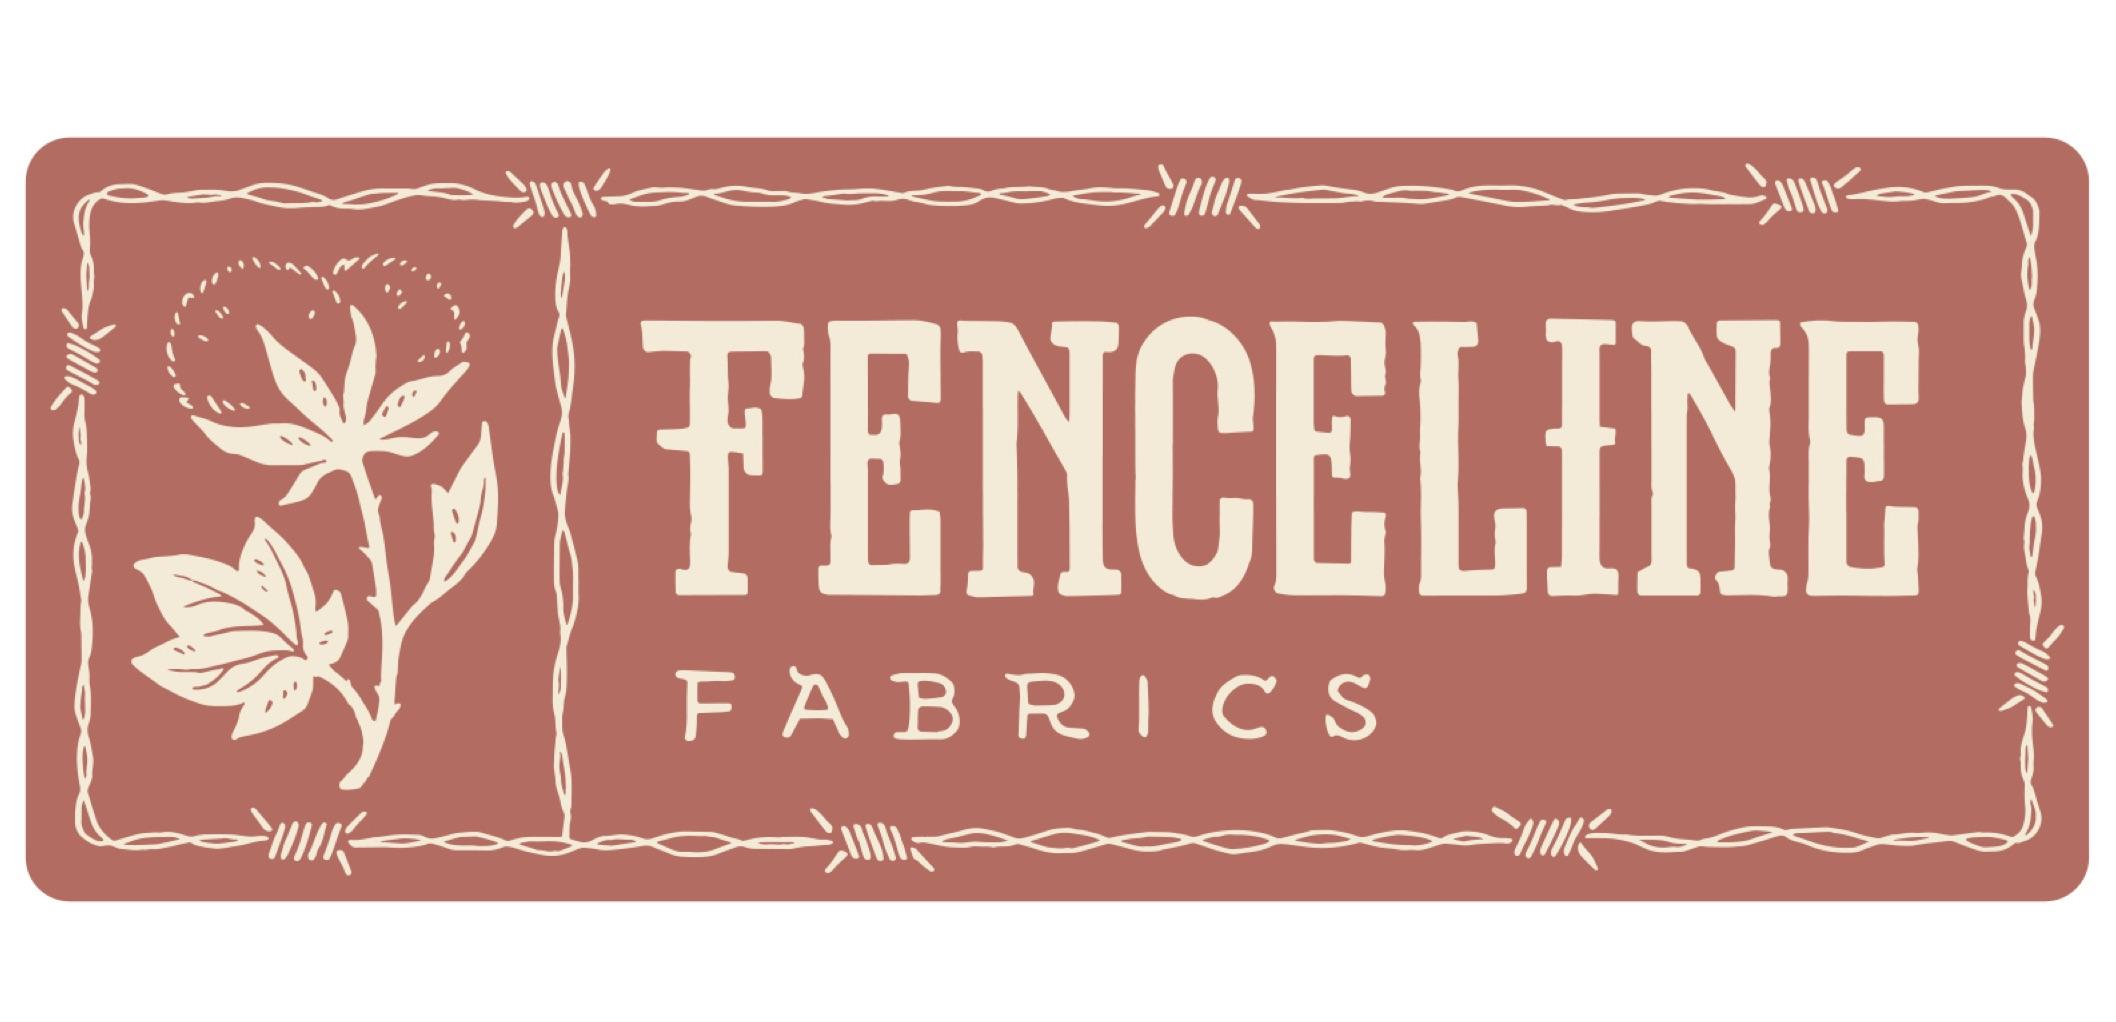 Fenceline 1000 x 475.jpg